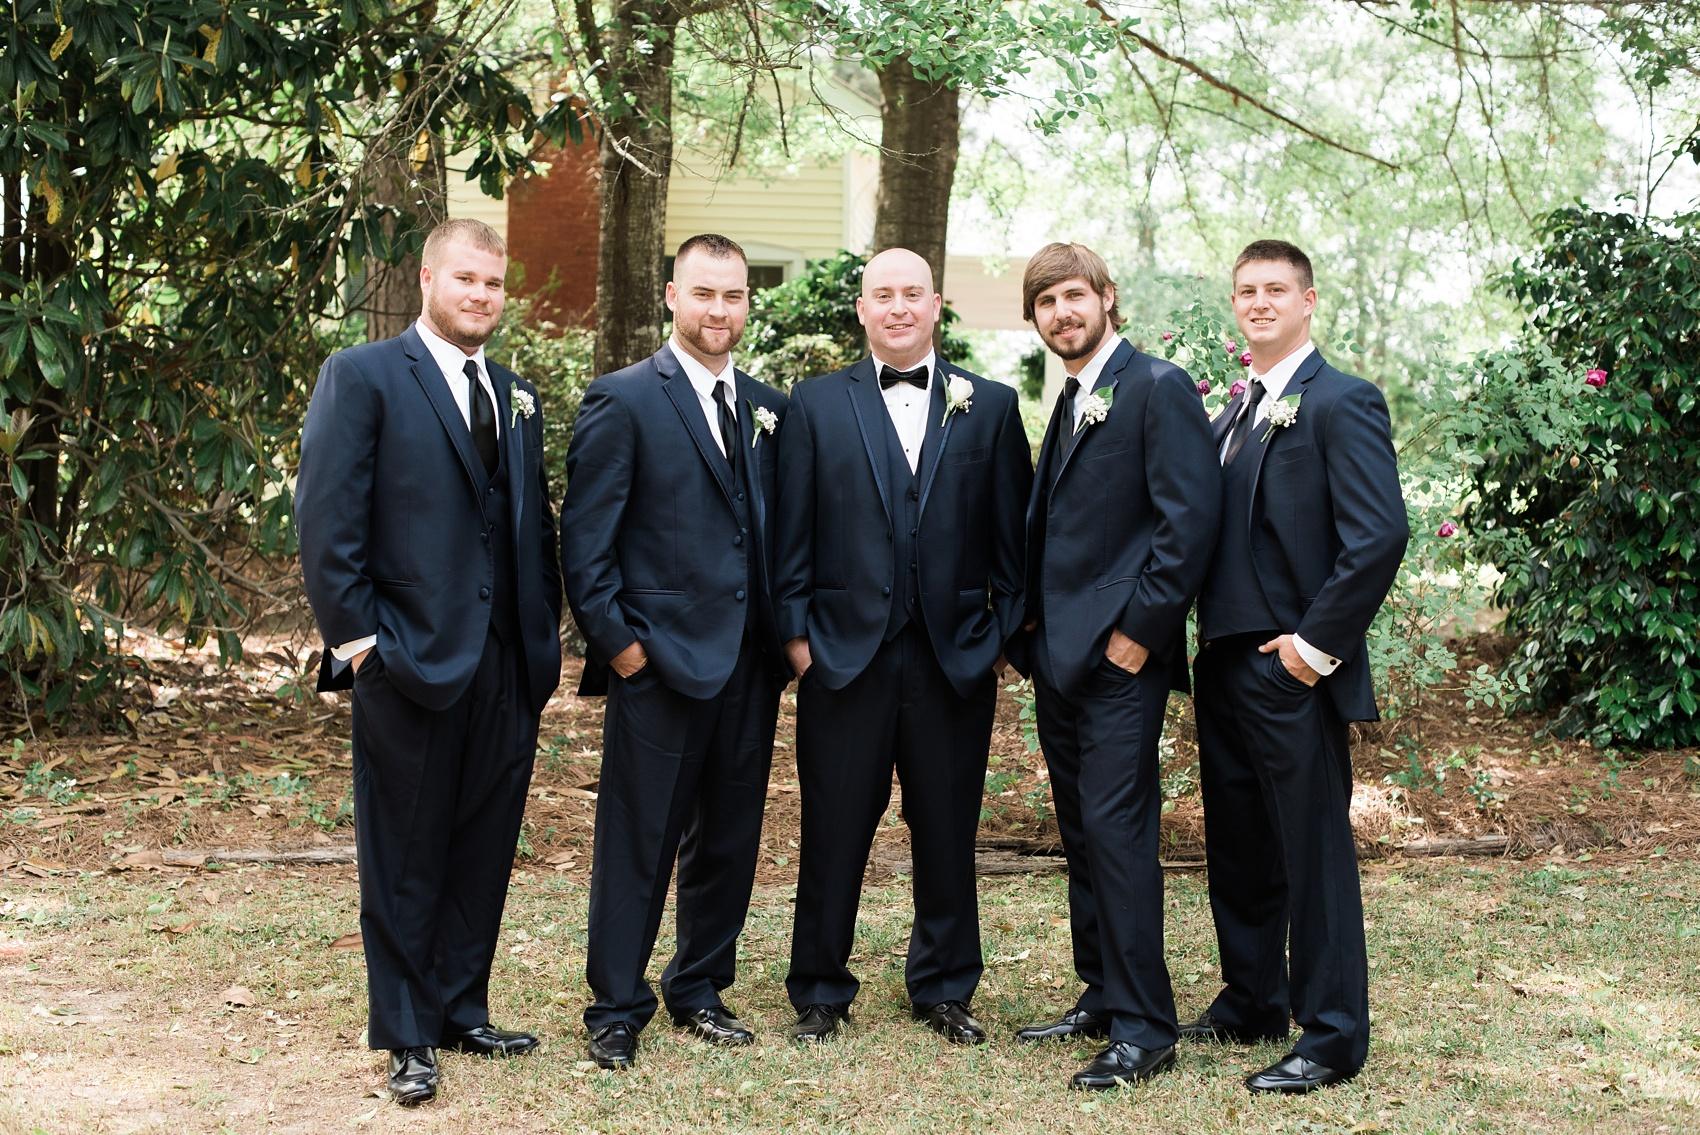 lexington_wedding_photographer_0116.jpg